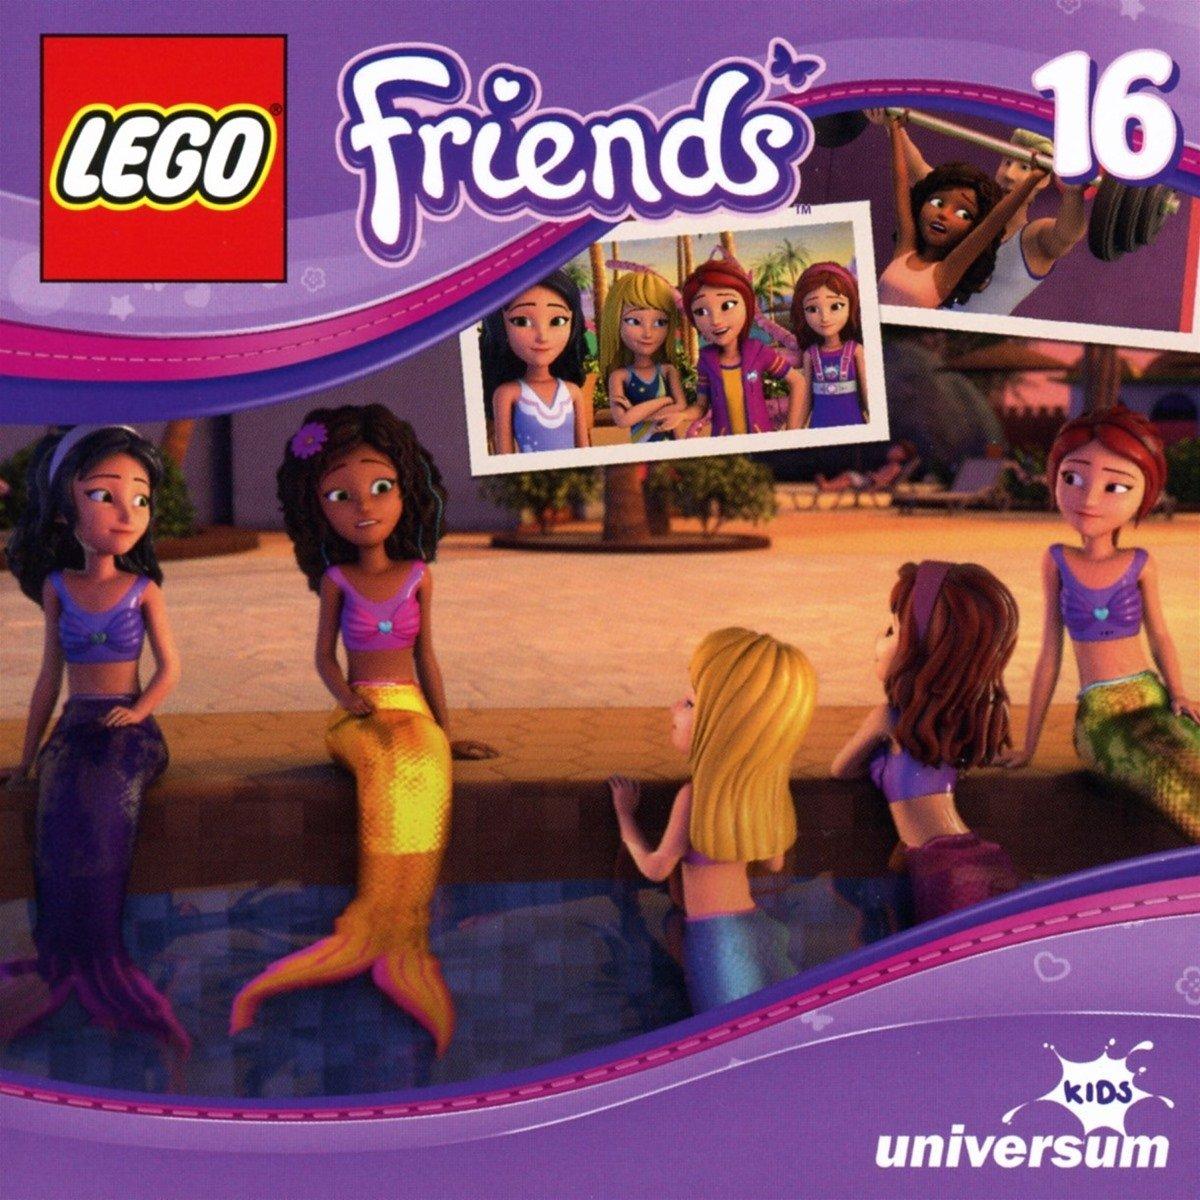 Lego Friends (CD 16) - Lego Friends: Amazon.de: Musik